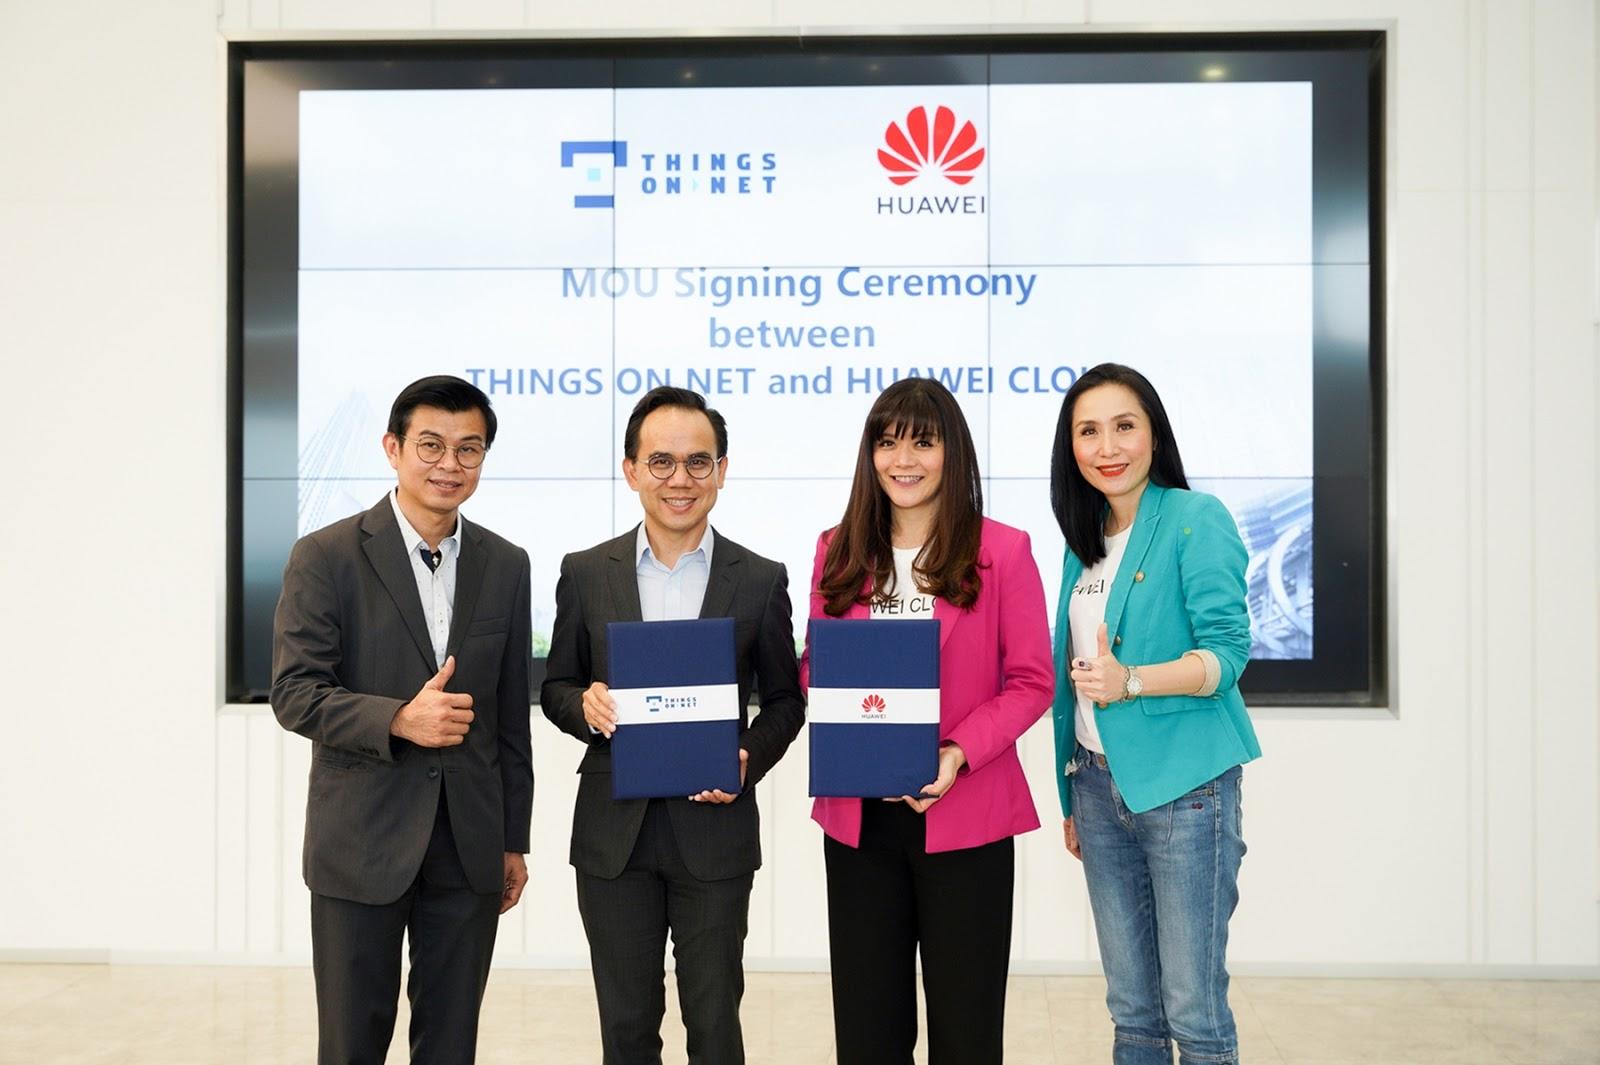 Things on Net ผนึก Huawei เพิ่มขุมพลังโซลูชันสำรองข้อมูลที่ปกป้องความปลอดภัยขั้นสูงสุด (secure backup solution)